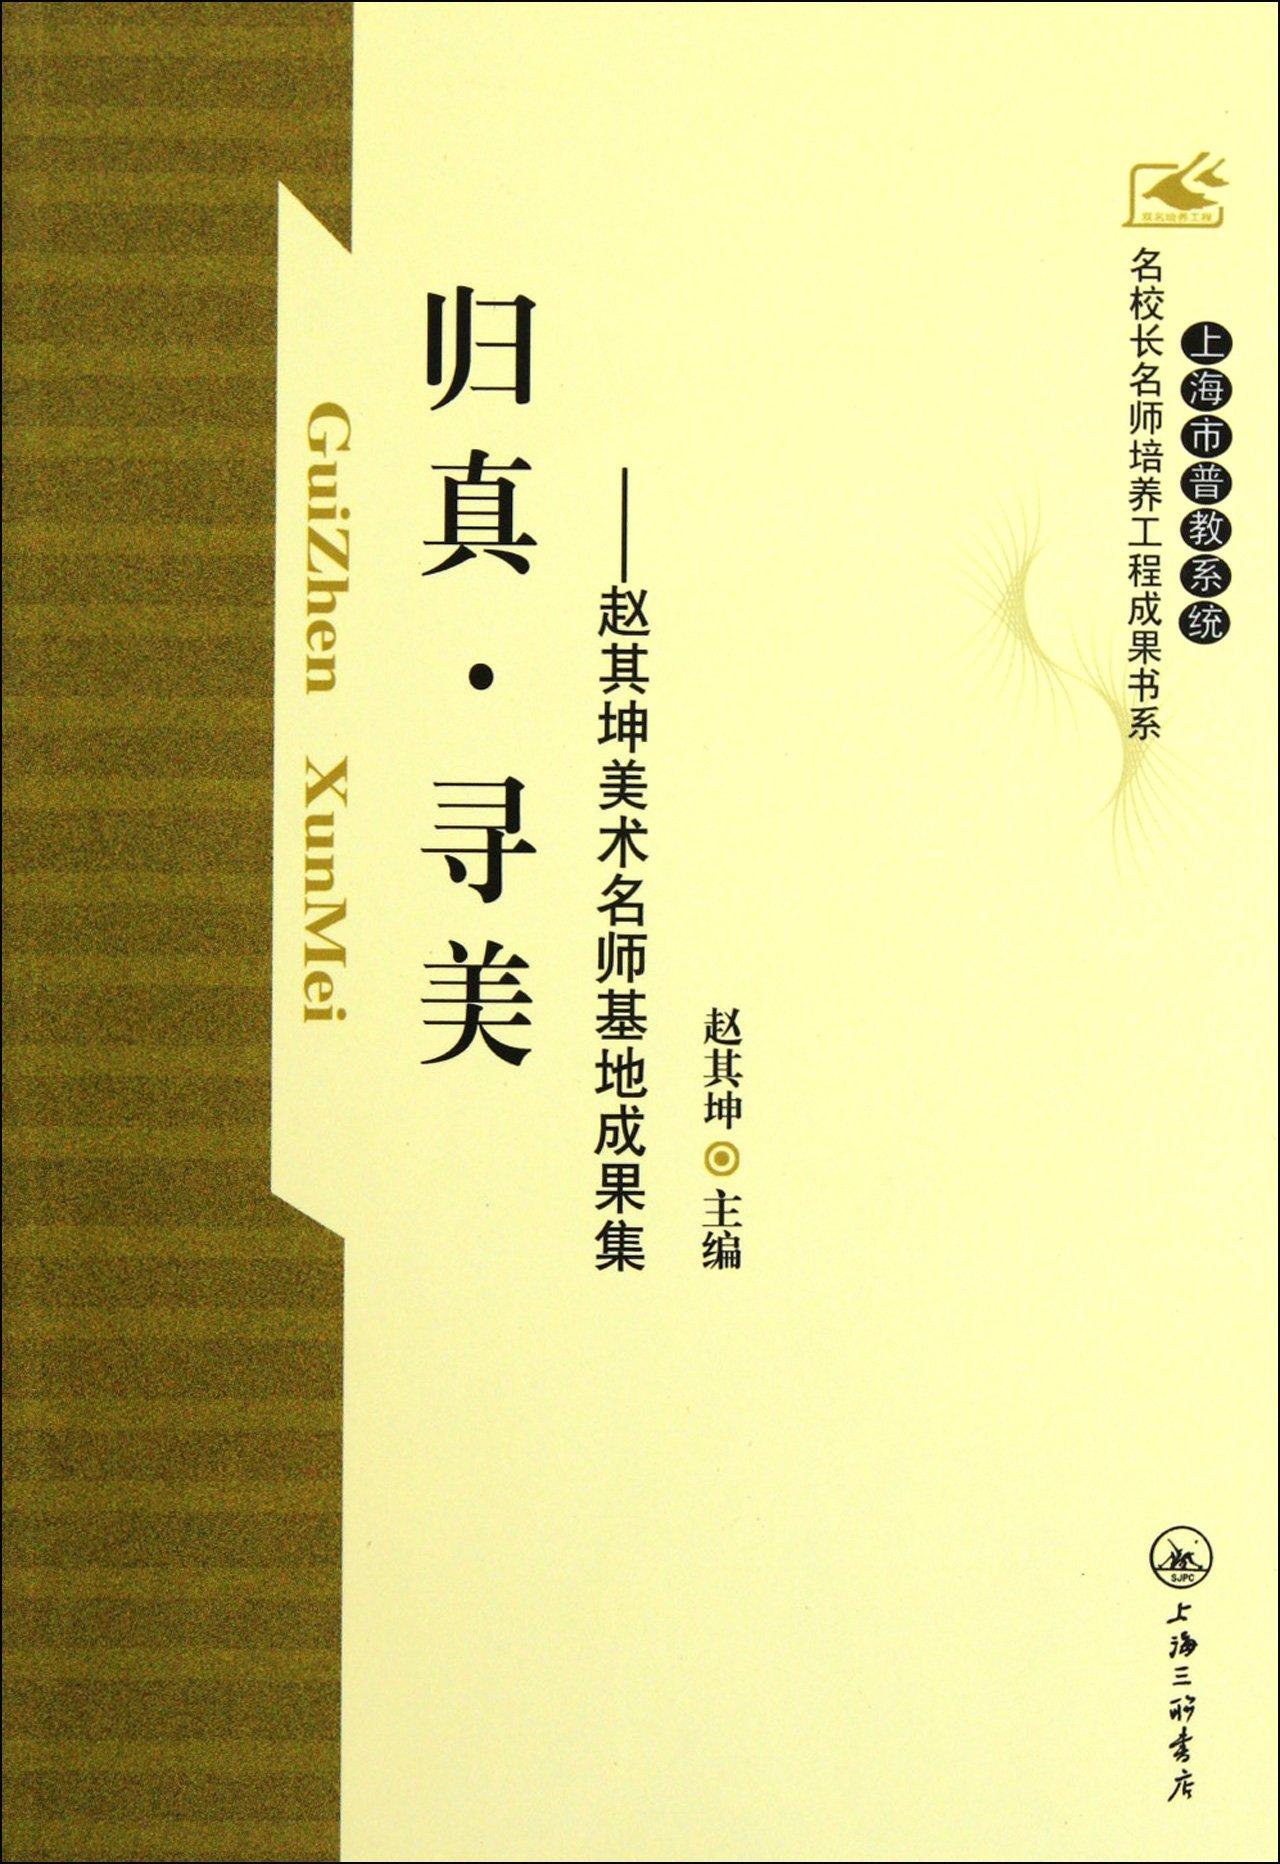 Download Maut · Seeking Beauty-- The Works of Zhao Qikun Artistic Teacher Base (Chinese Edition) ebook